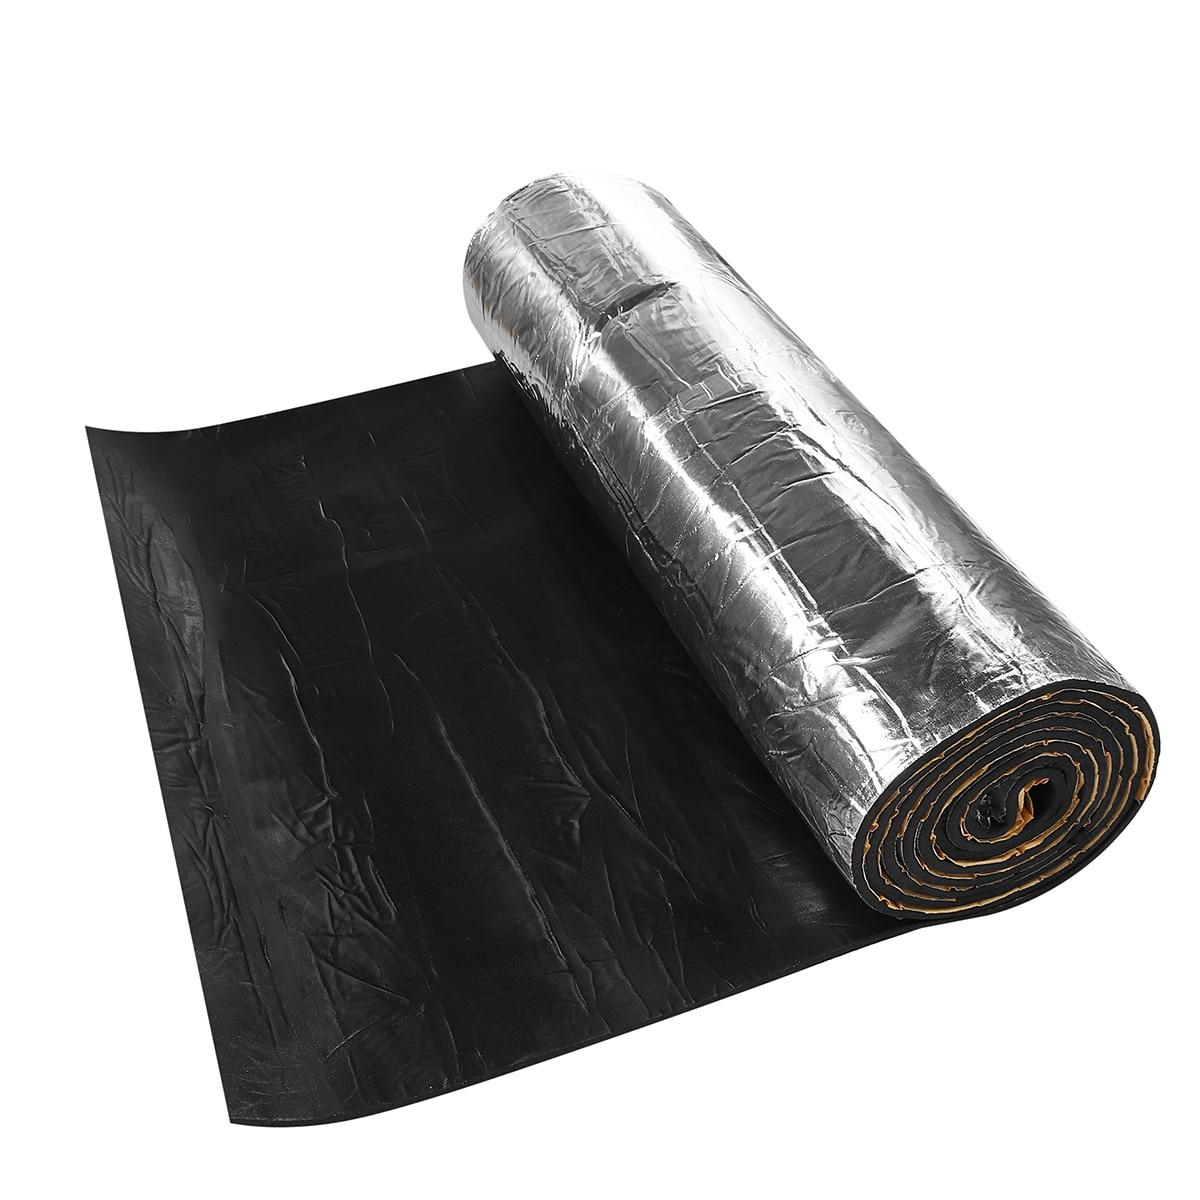 1x5m 10mm 1 Roll Self-adhesive Car Auto Sound Deadening Cotton Heat Insulation Pad Foam Material Automobiles Interior Accessorie